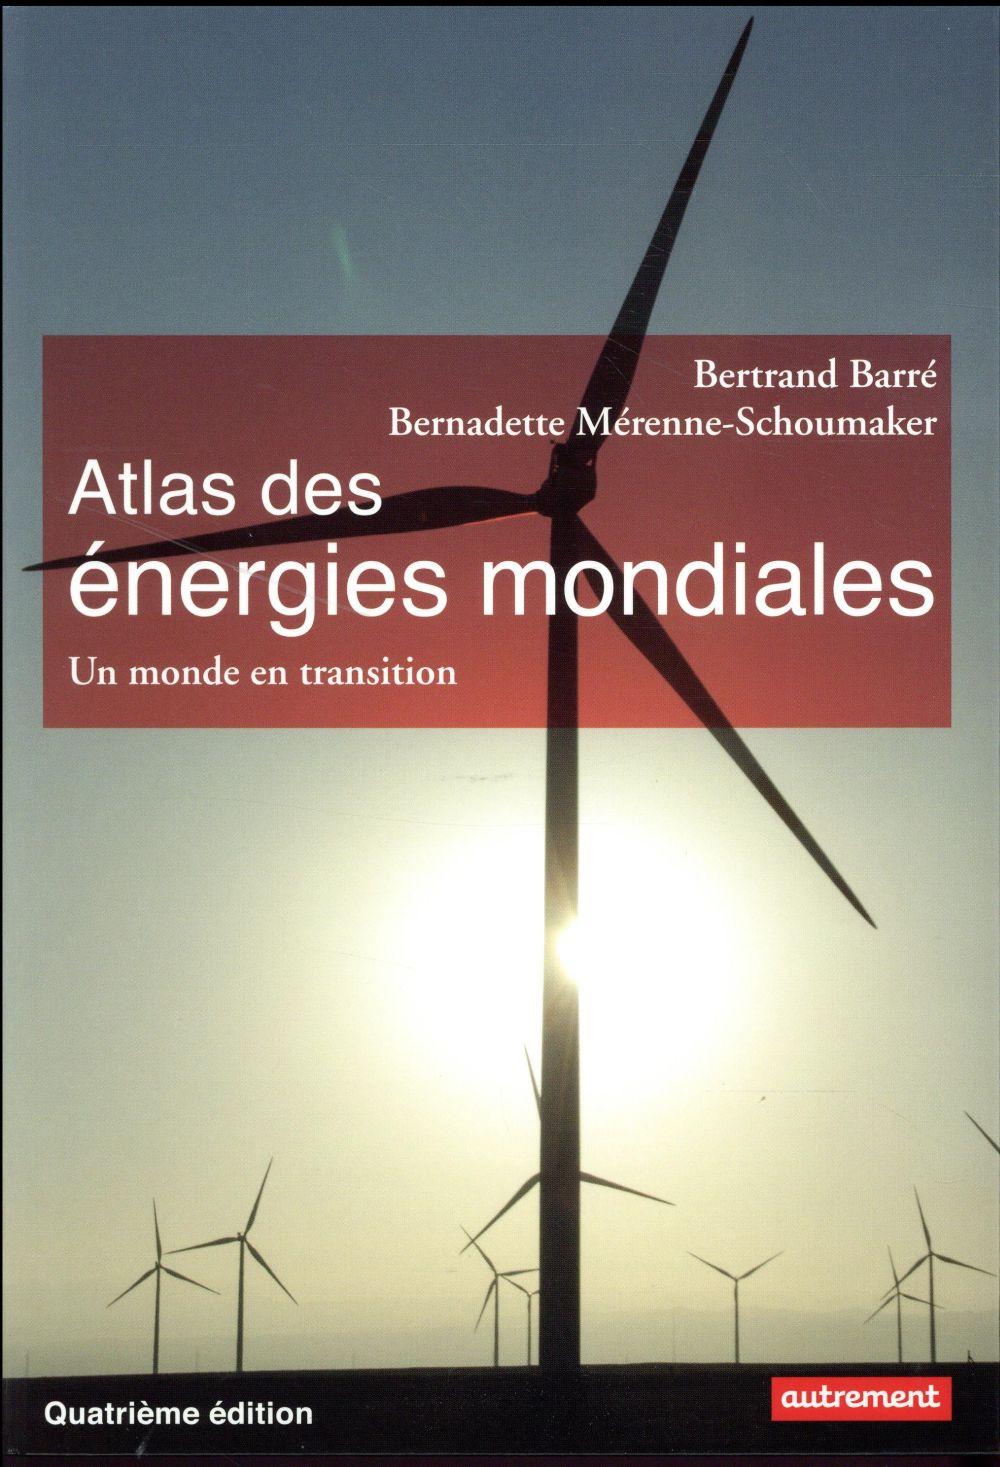 ATLAS DES ENERGIES MONDIALES  -  UN MONDE EN TRANSITION (4E EDITION)